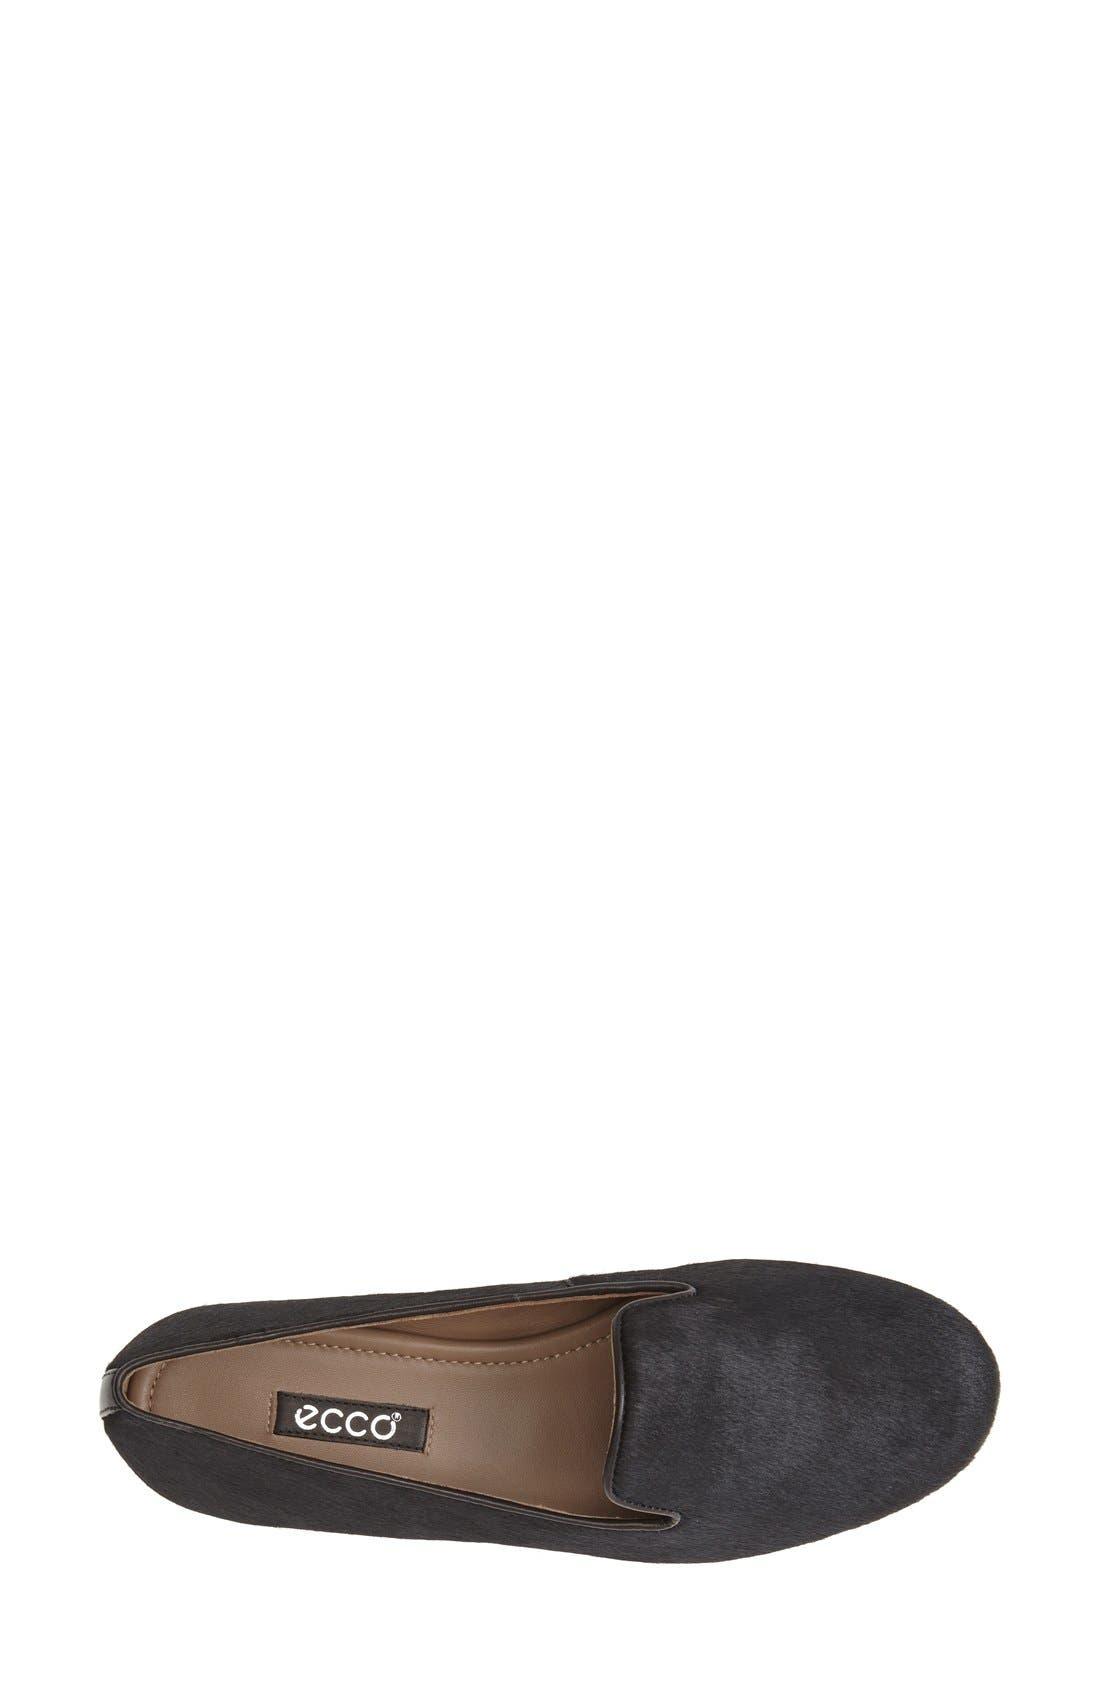 ECCO, 'Perth' Calf Hair Loafer, Alternate thumbnail 3, color, 006